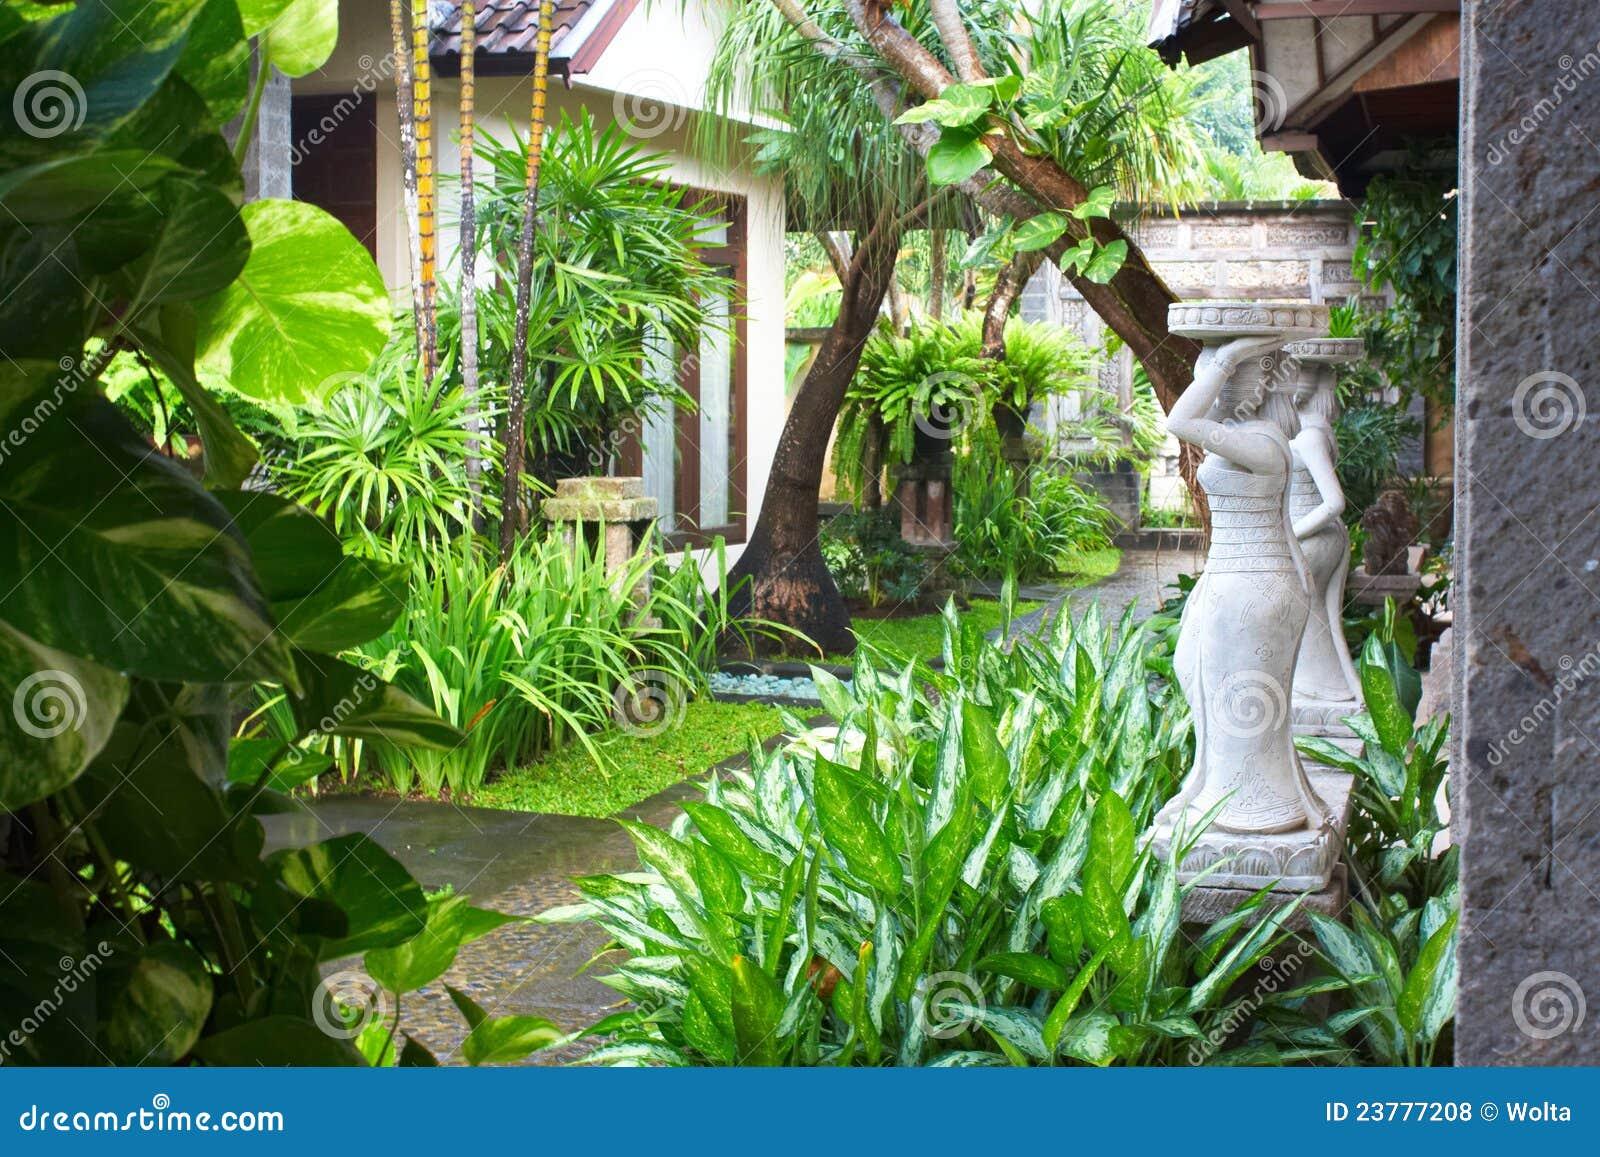 Jardin tropical photos libres de droits image 23777208 for Jardin tropical